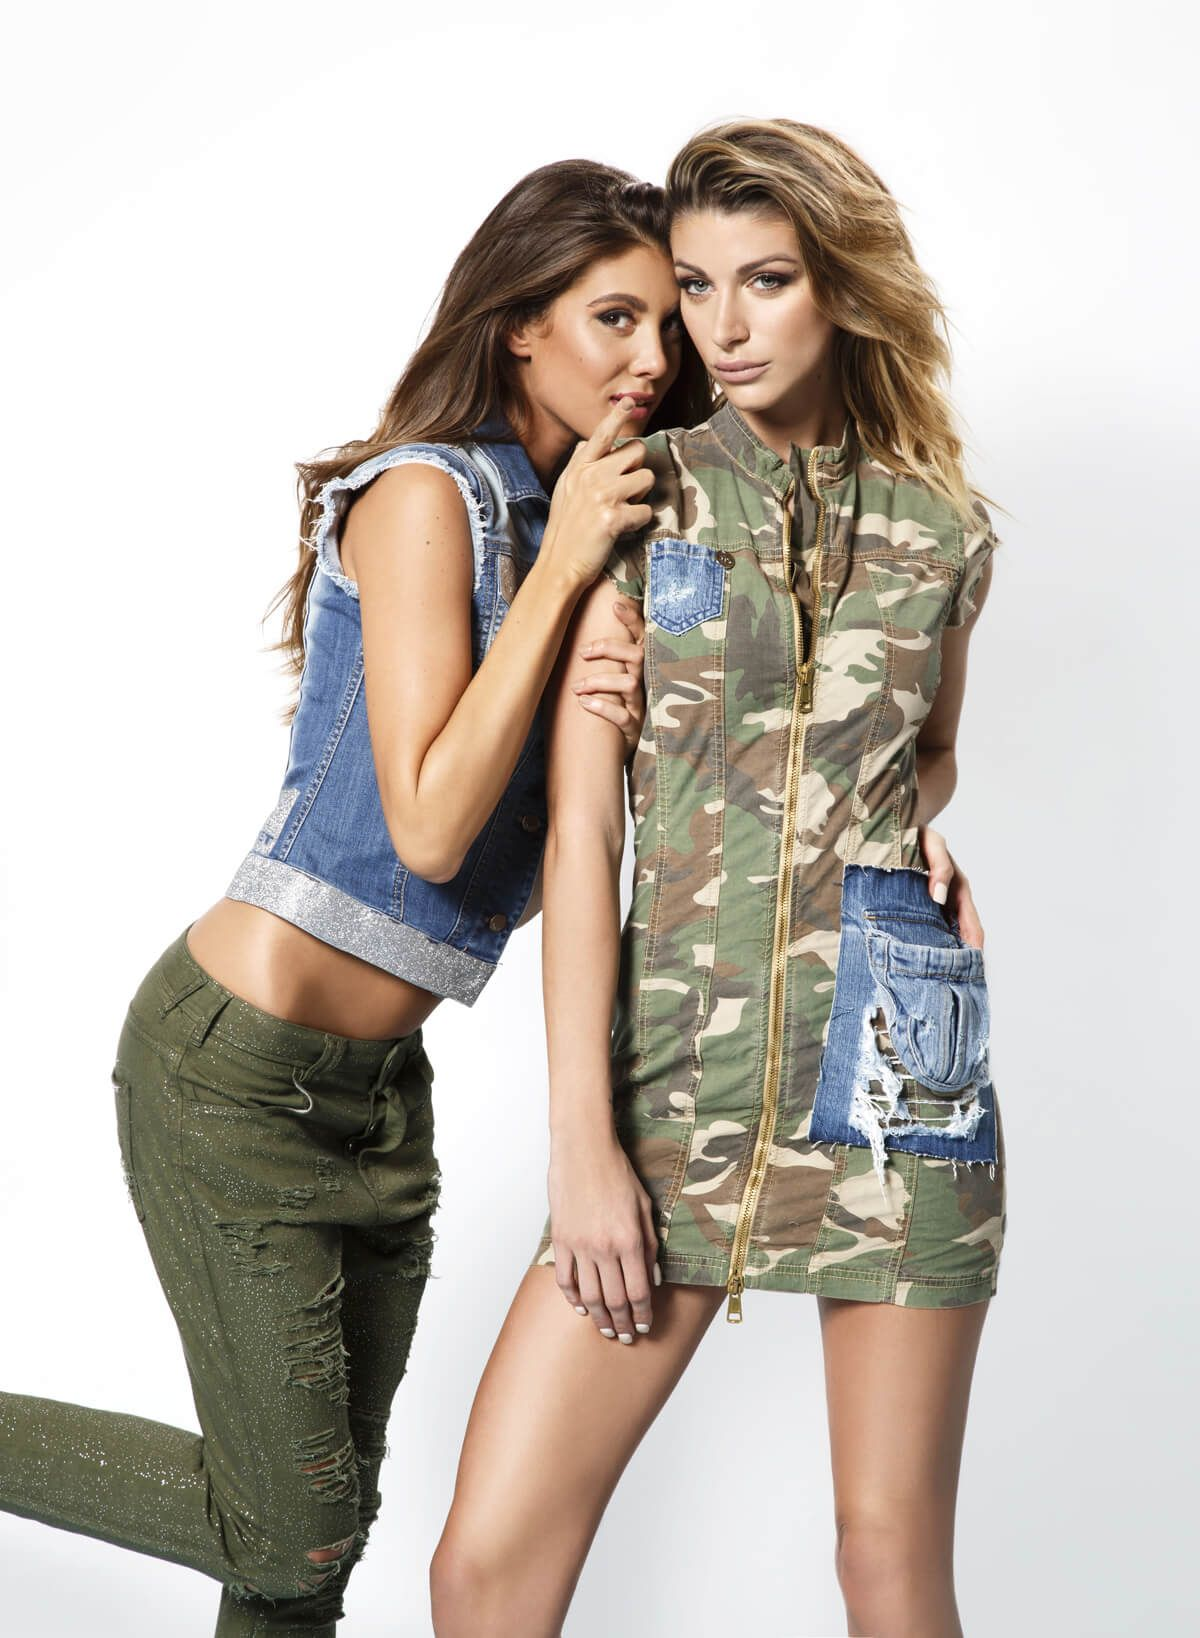 Spring/Summer 2017 Preview #metjeans #metloves #springsummer17 #METss17 #jeans #denim #spring #summer #outfit #womensfashion #fashion #women #apparel #style #green #pink #white #green #girl #girls